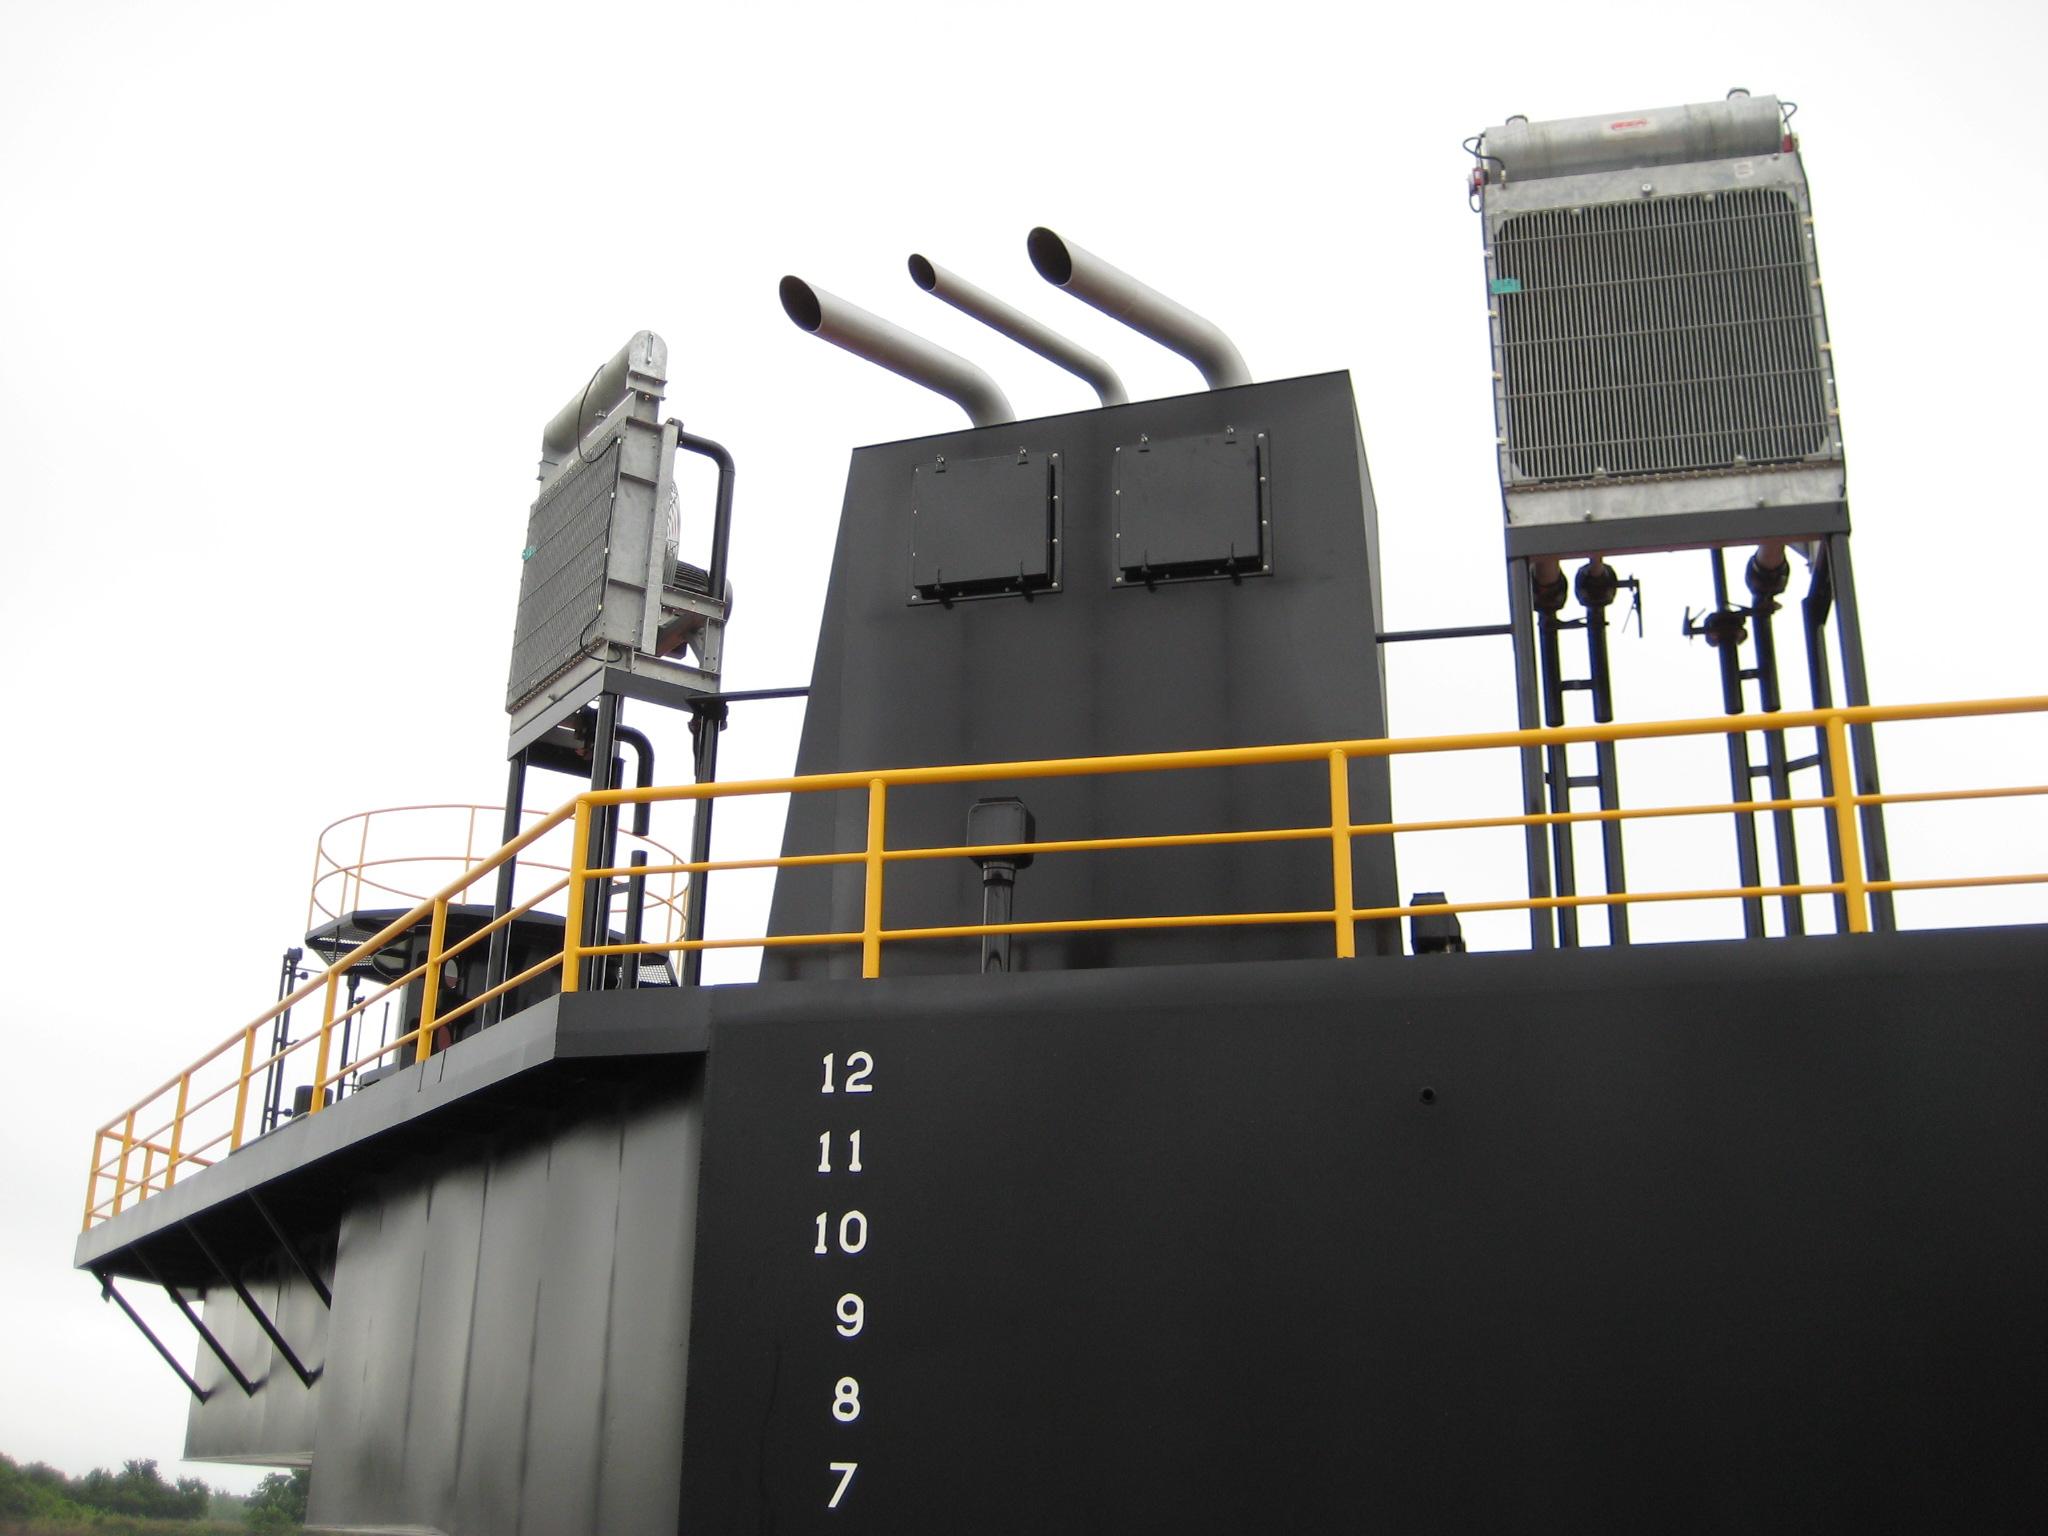 Class 200 Liftboat Hull